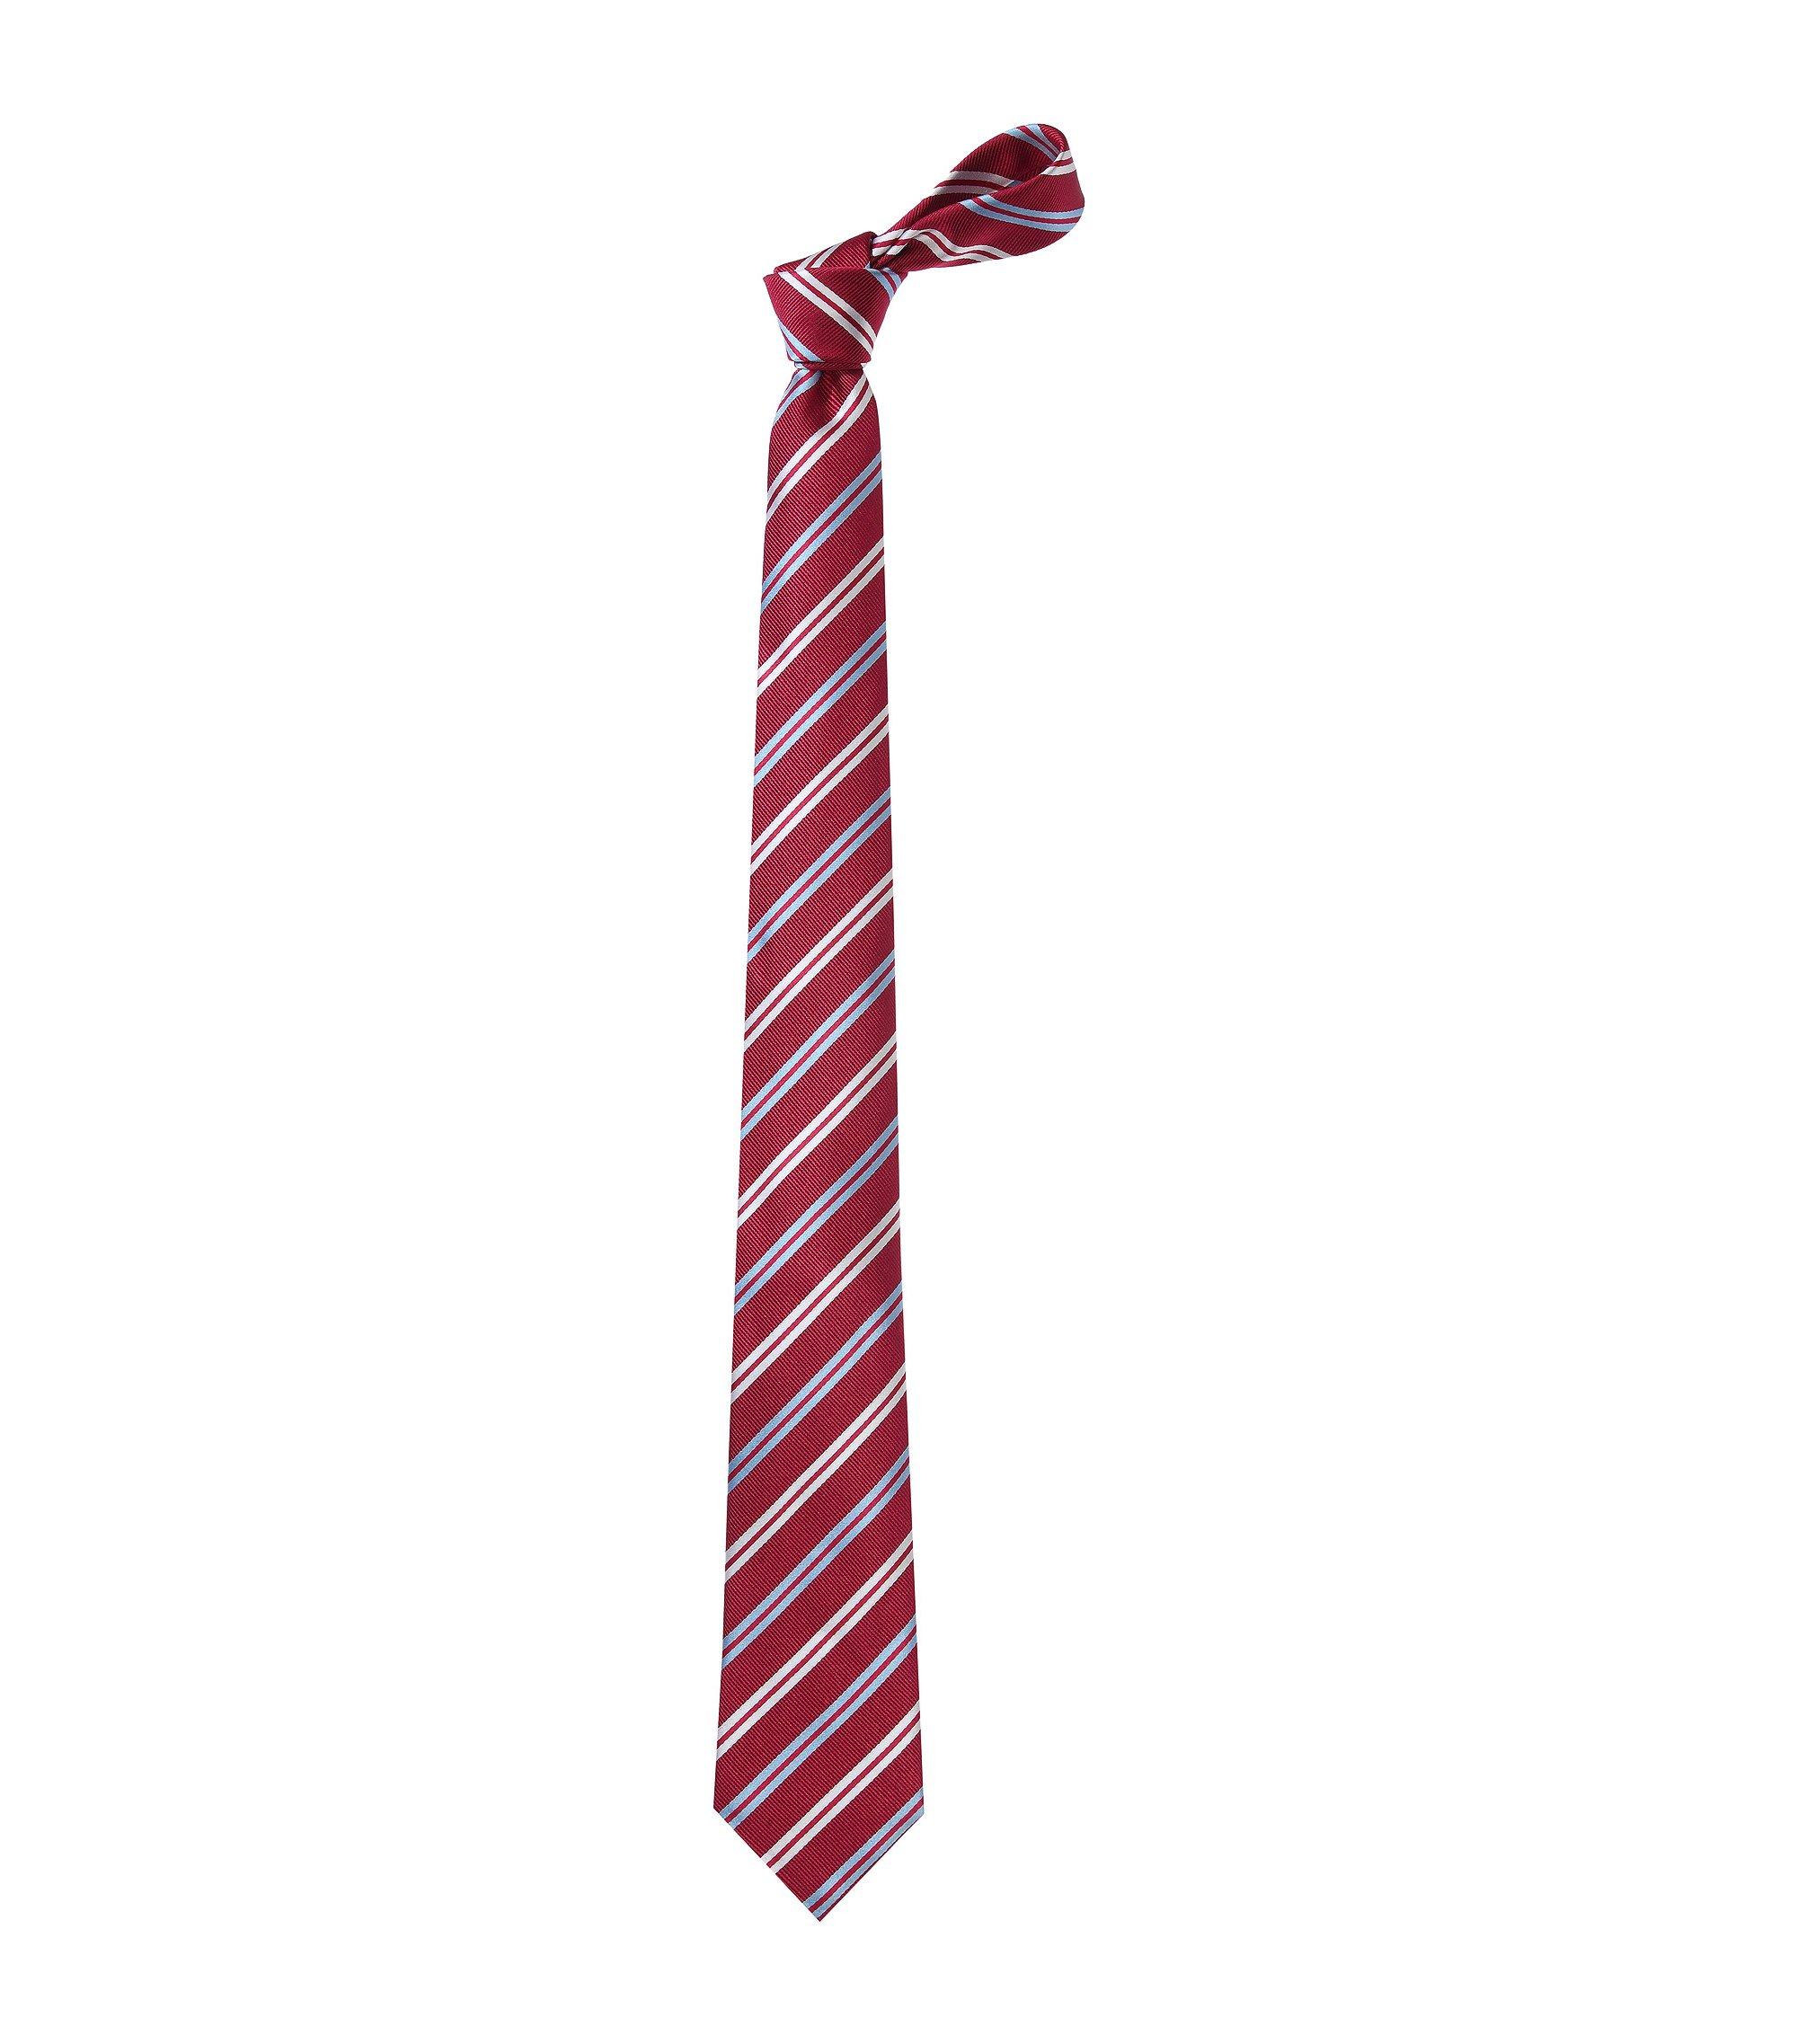 Krawatte ´Tie 7,5 cm` aus Seide, Rot